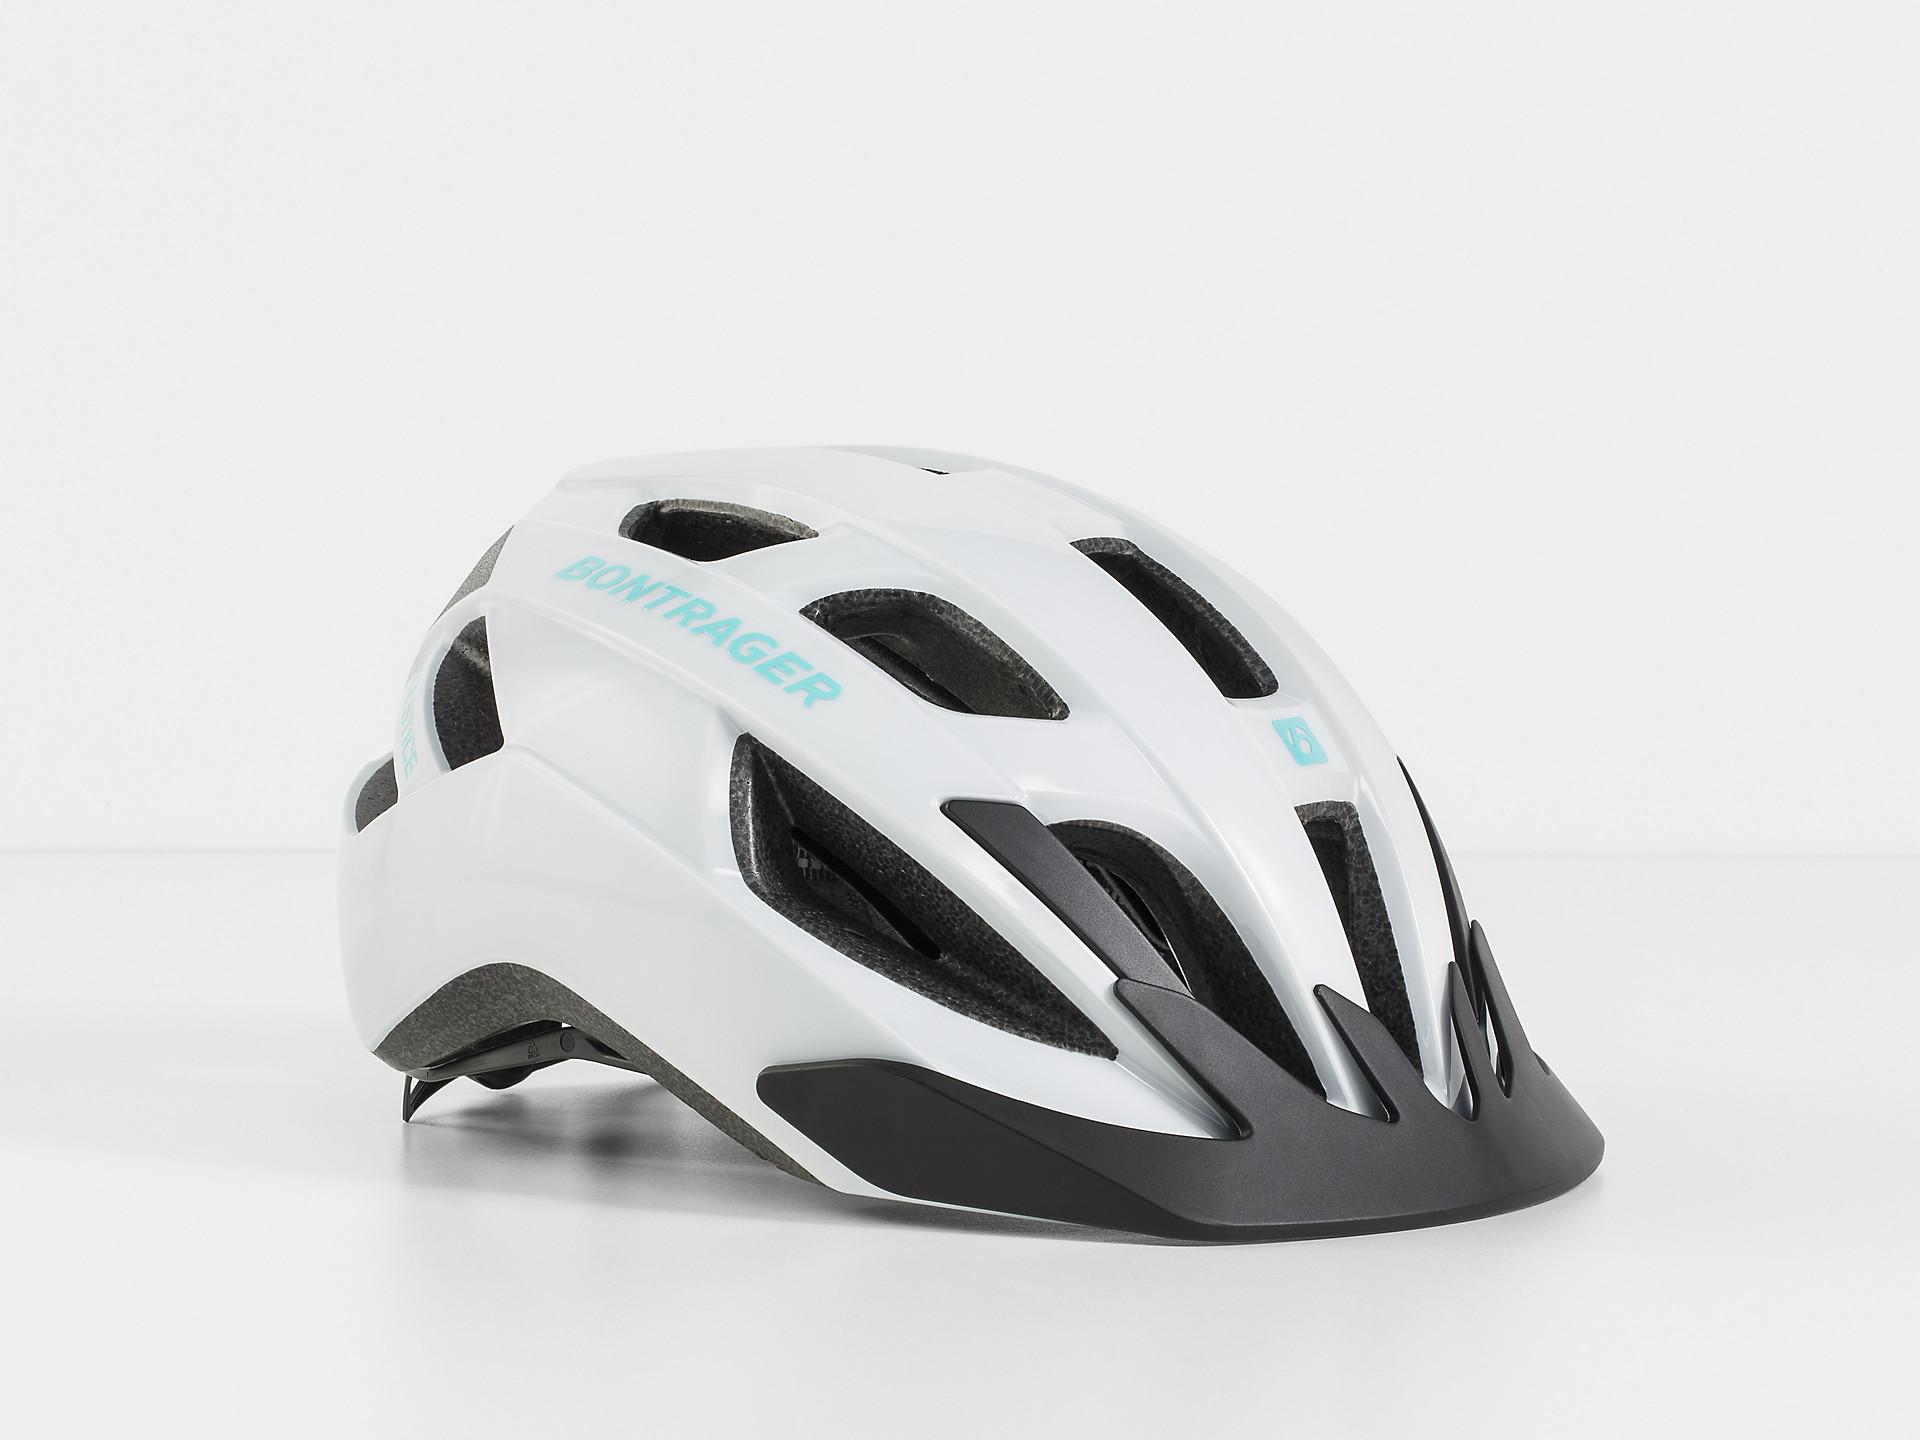 Capacete Ciclismo Solstice Bontrager